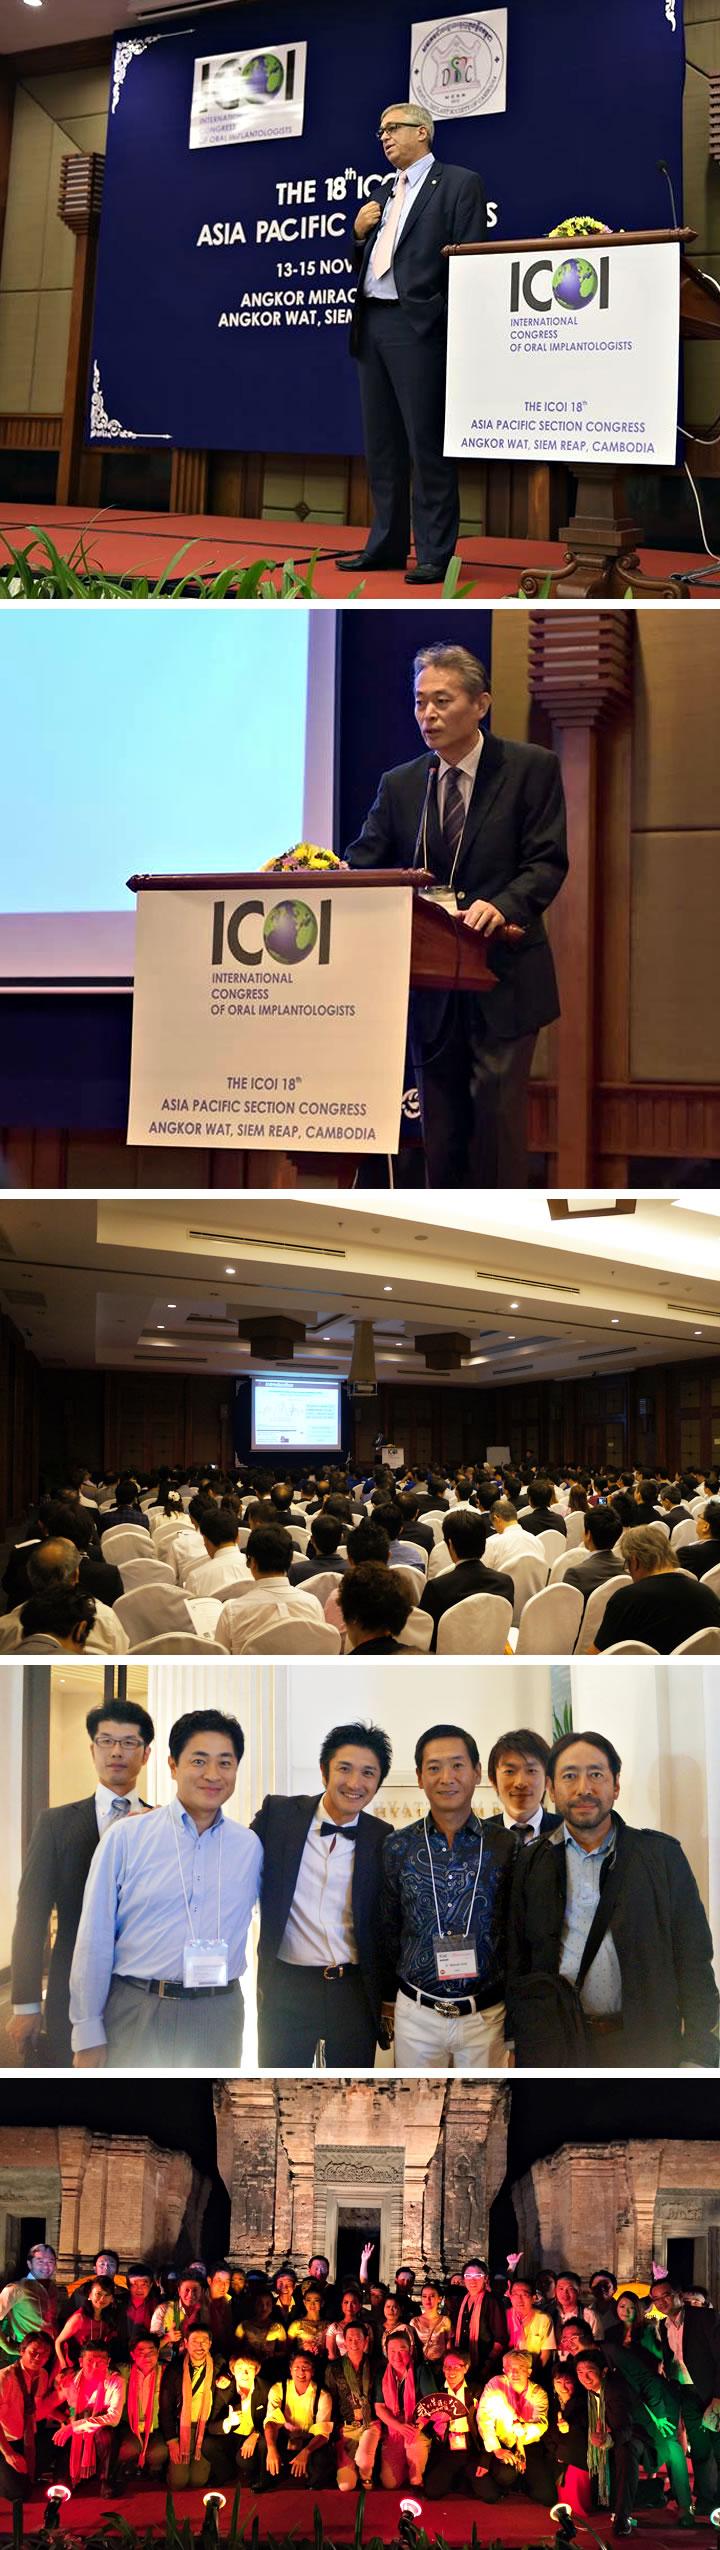 ICOI(国際口腔インプラント学会) カンボジア大会